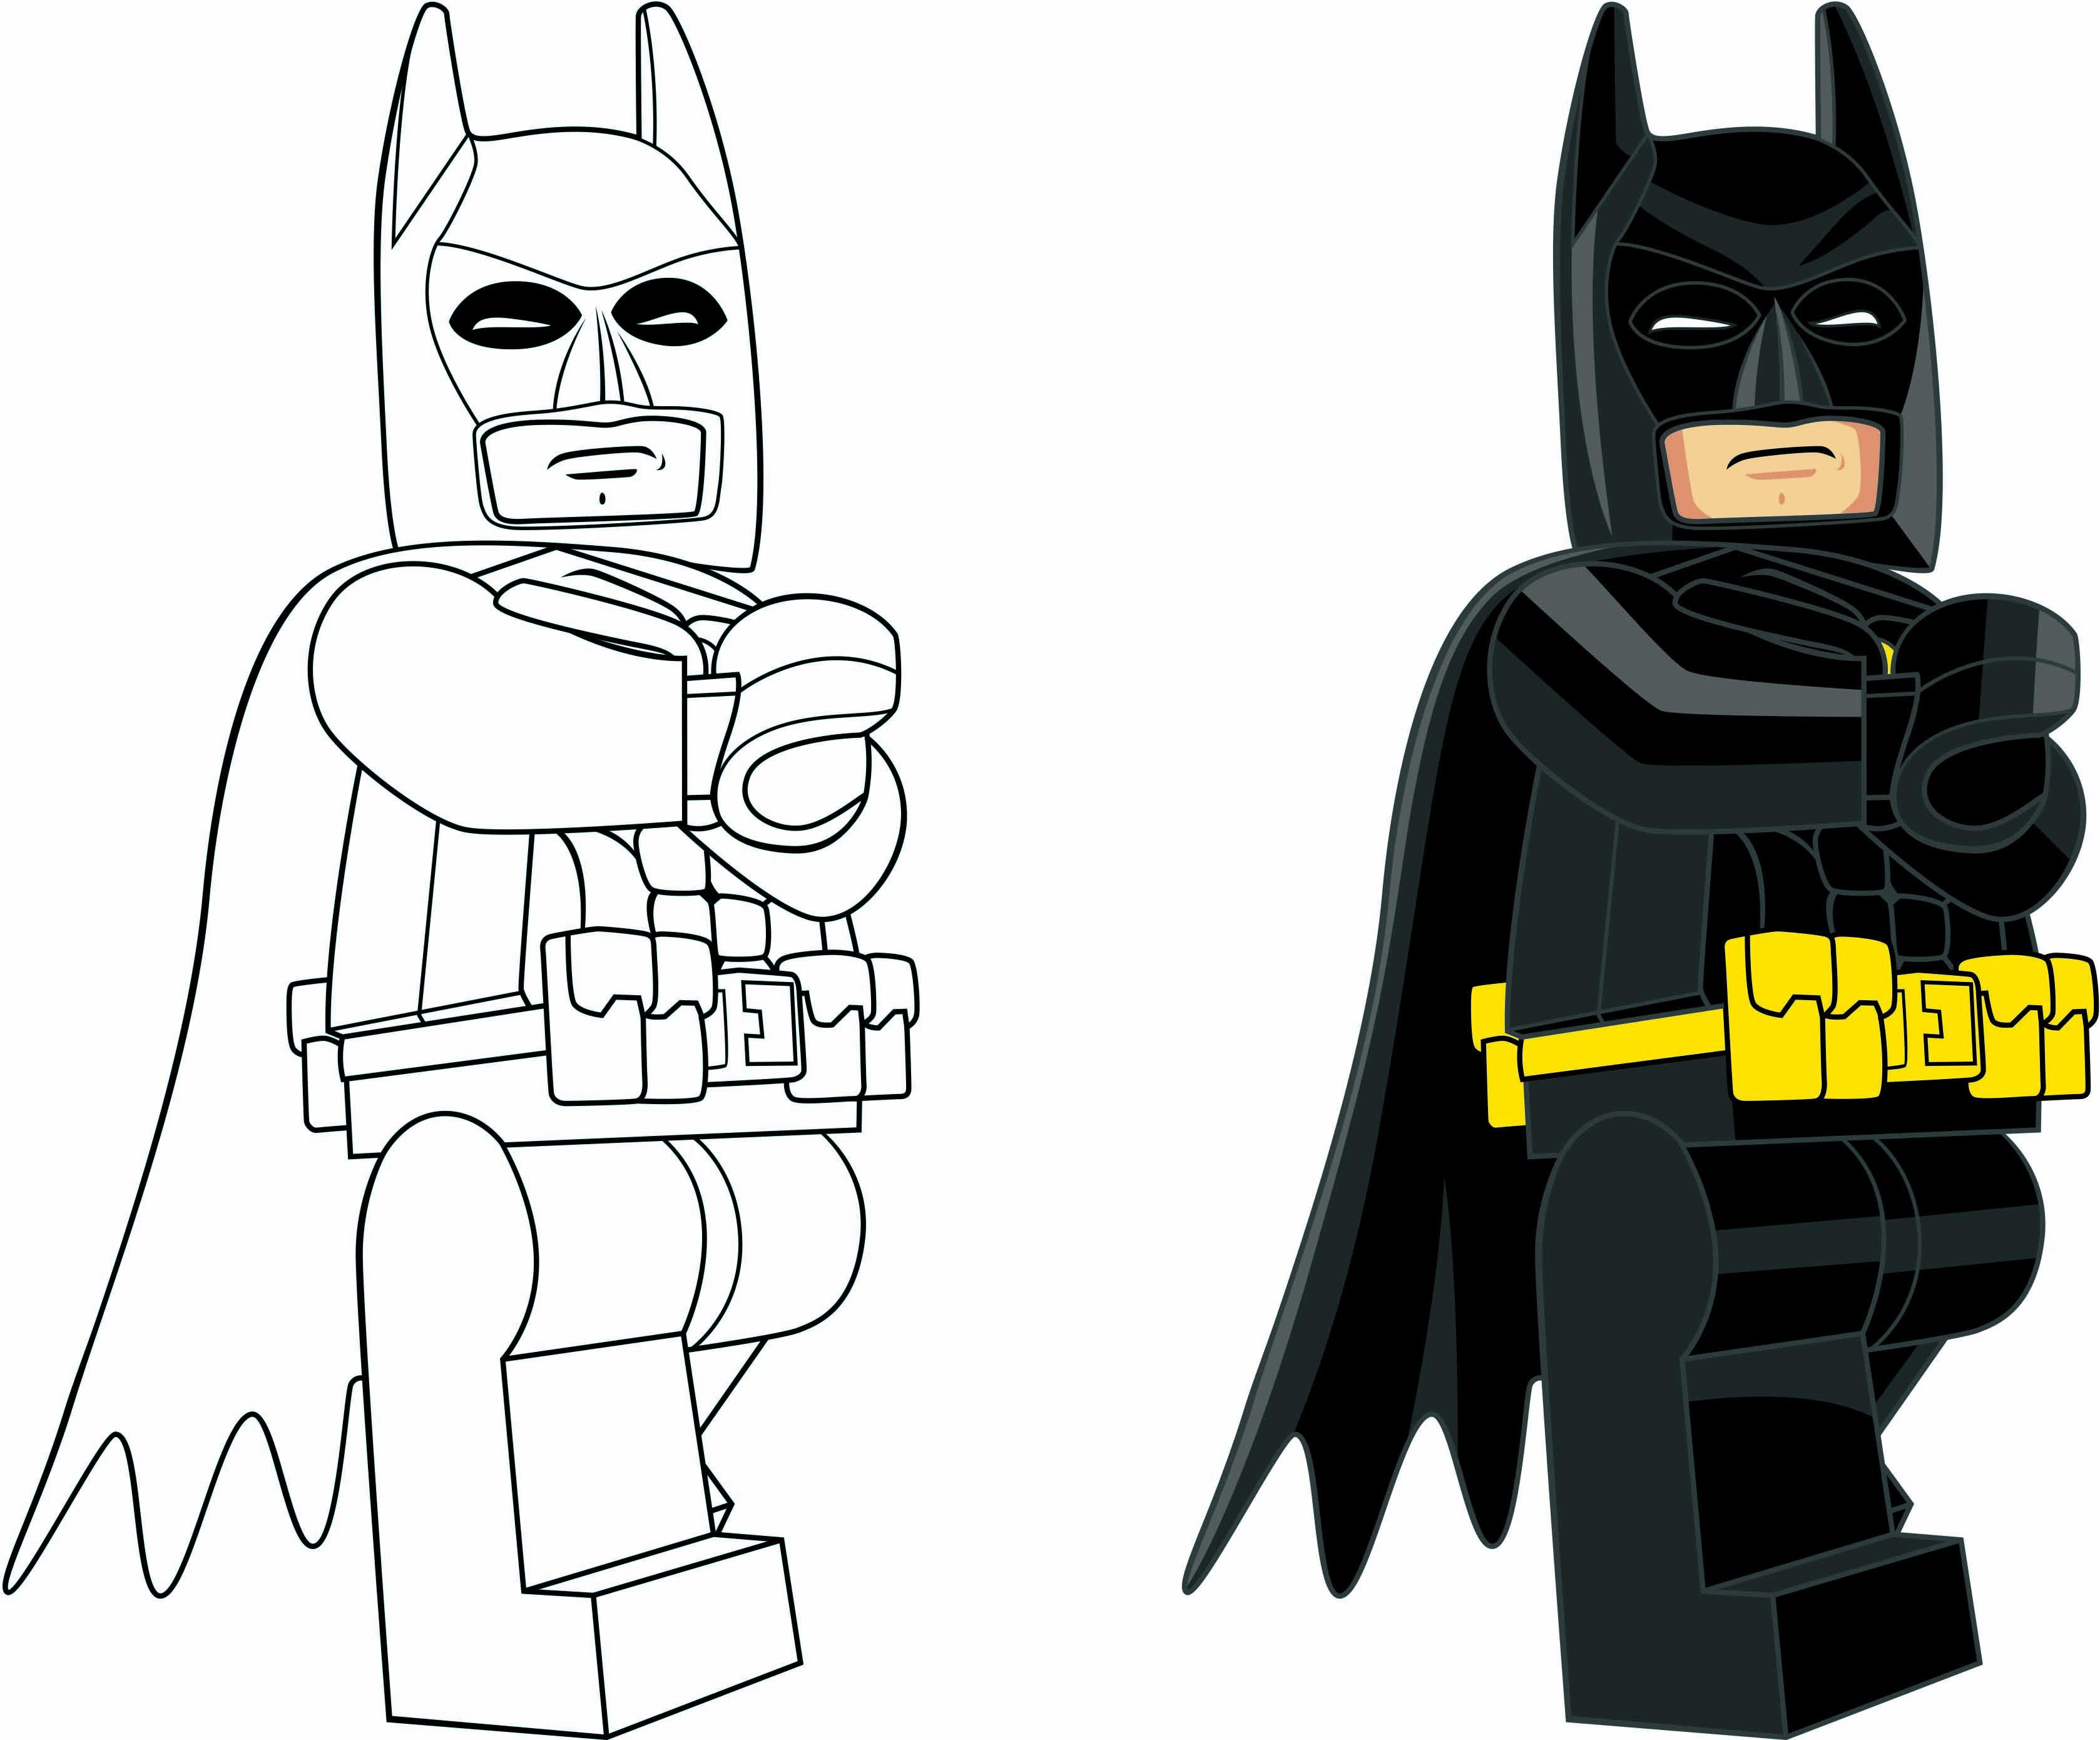 Kleurplaten Lego Heroes.Awesome Kleurplaat Lego Batman 2 Kleurplaten